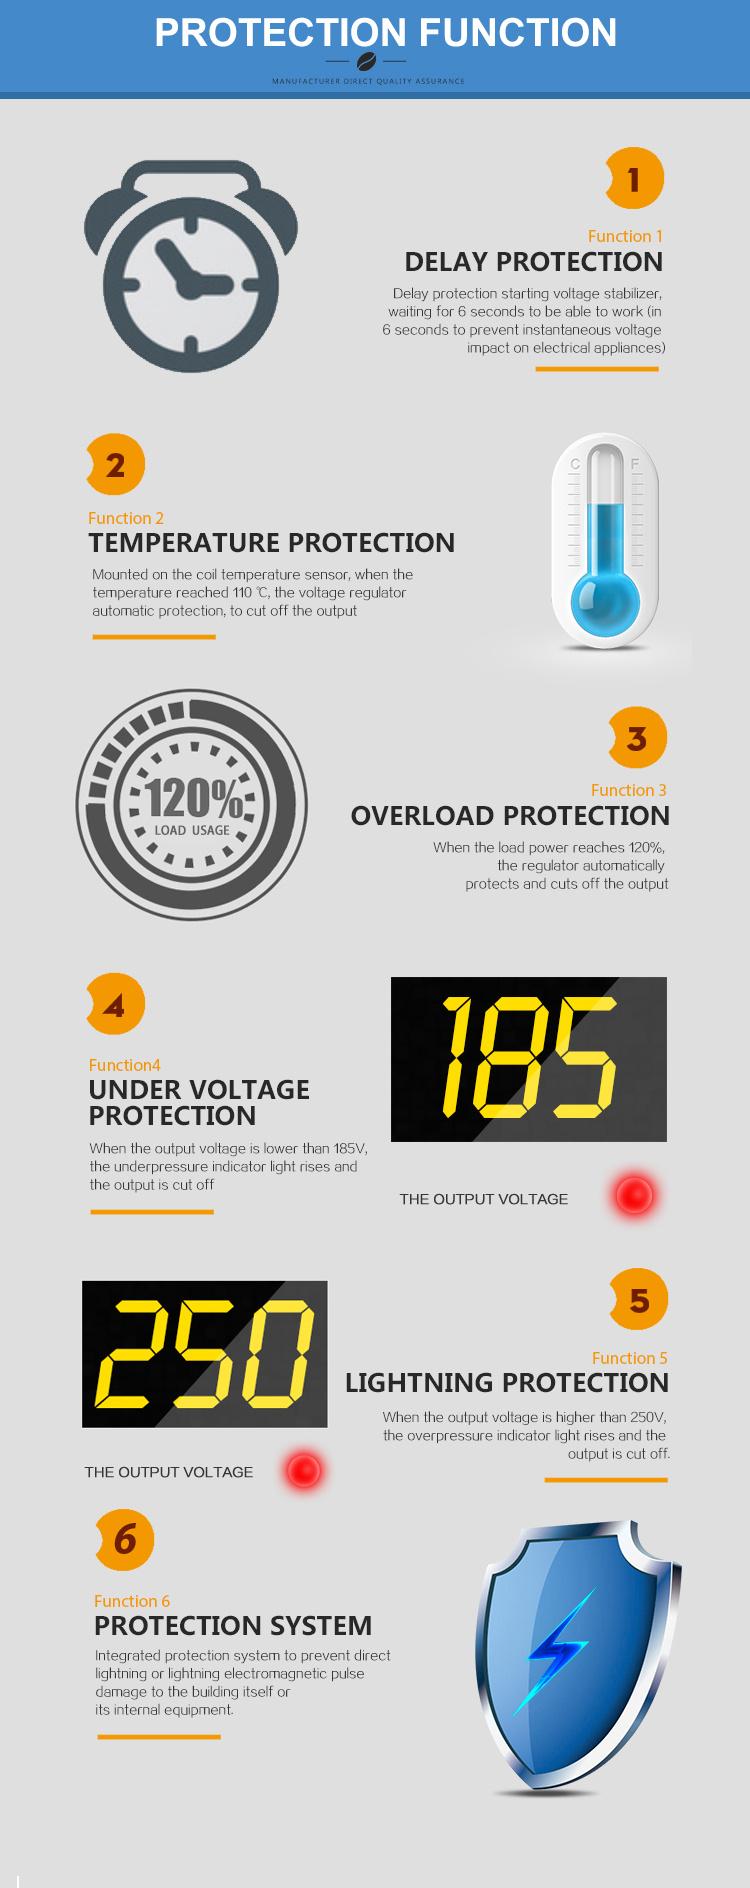 500VA 1000VA 2000VA Wall Mounted Automaitc Voltage Regulator Stabilizers